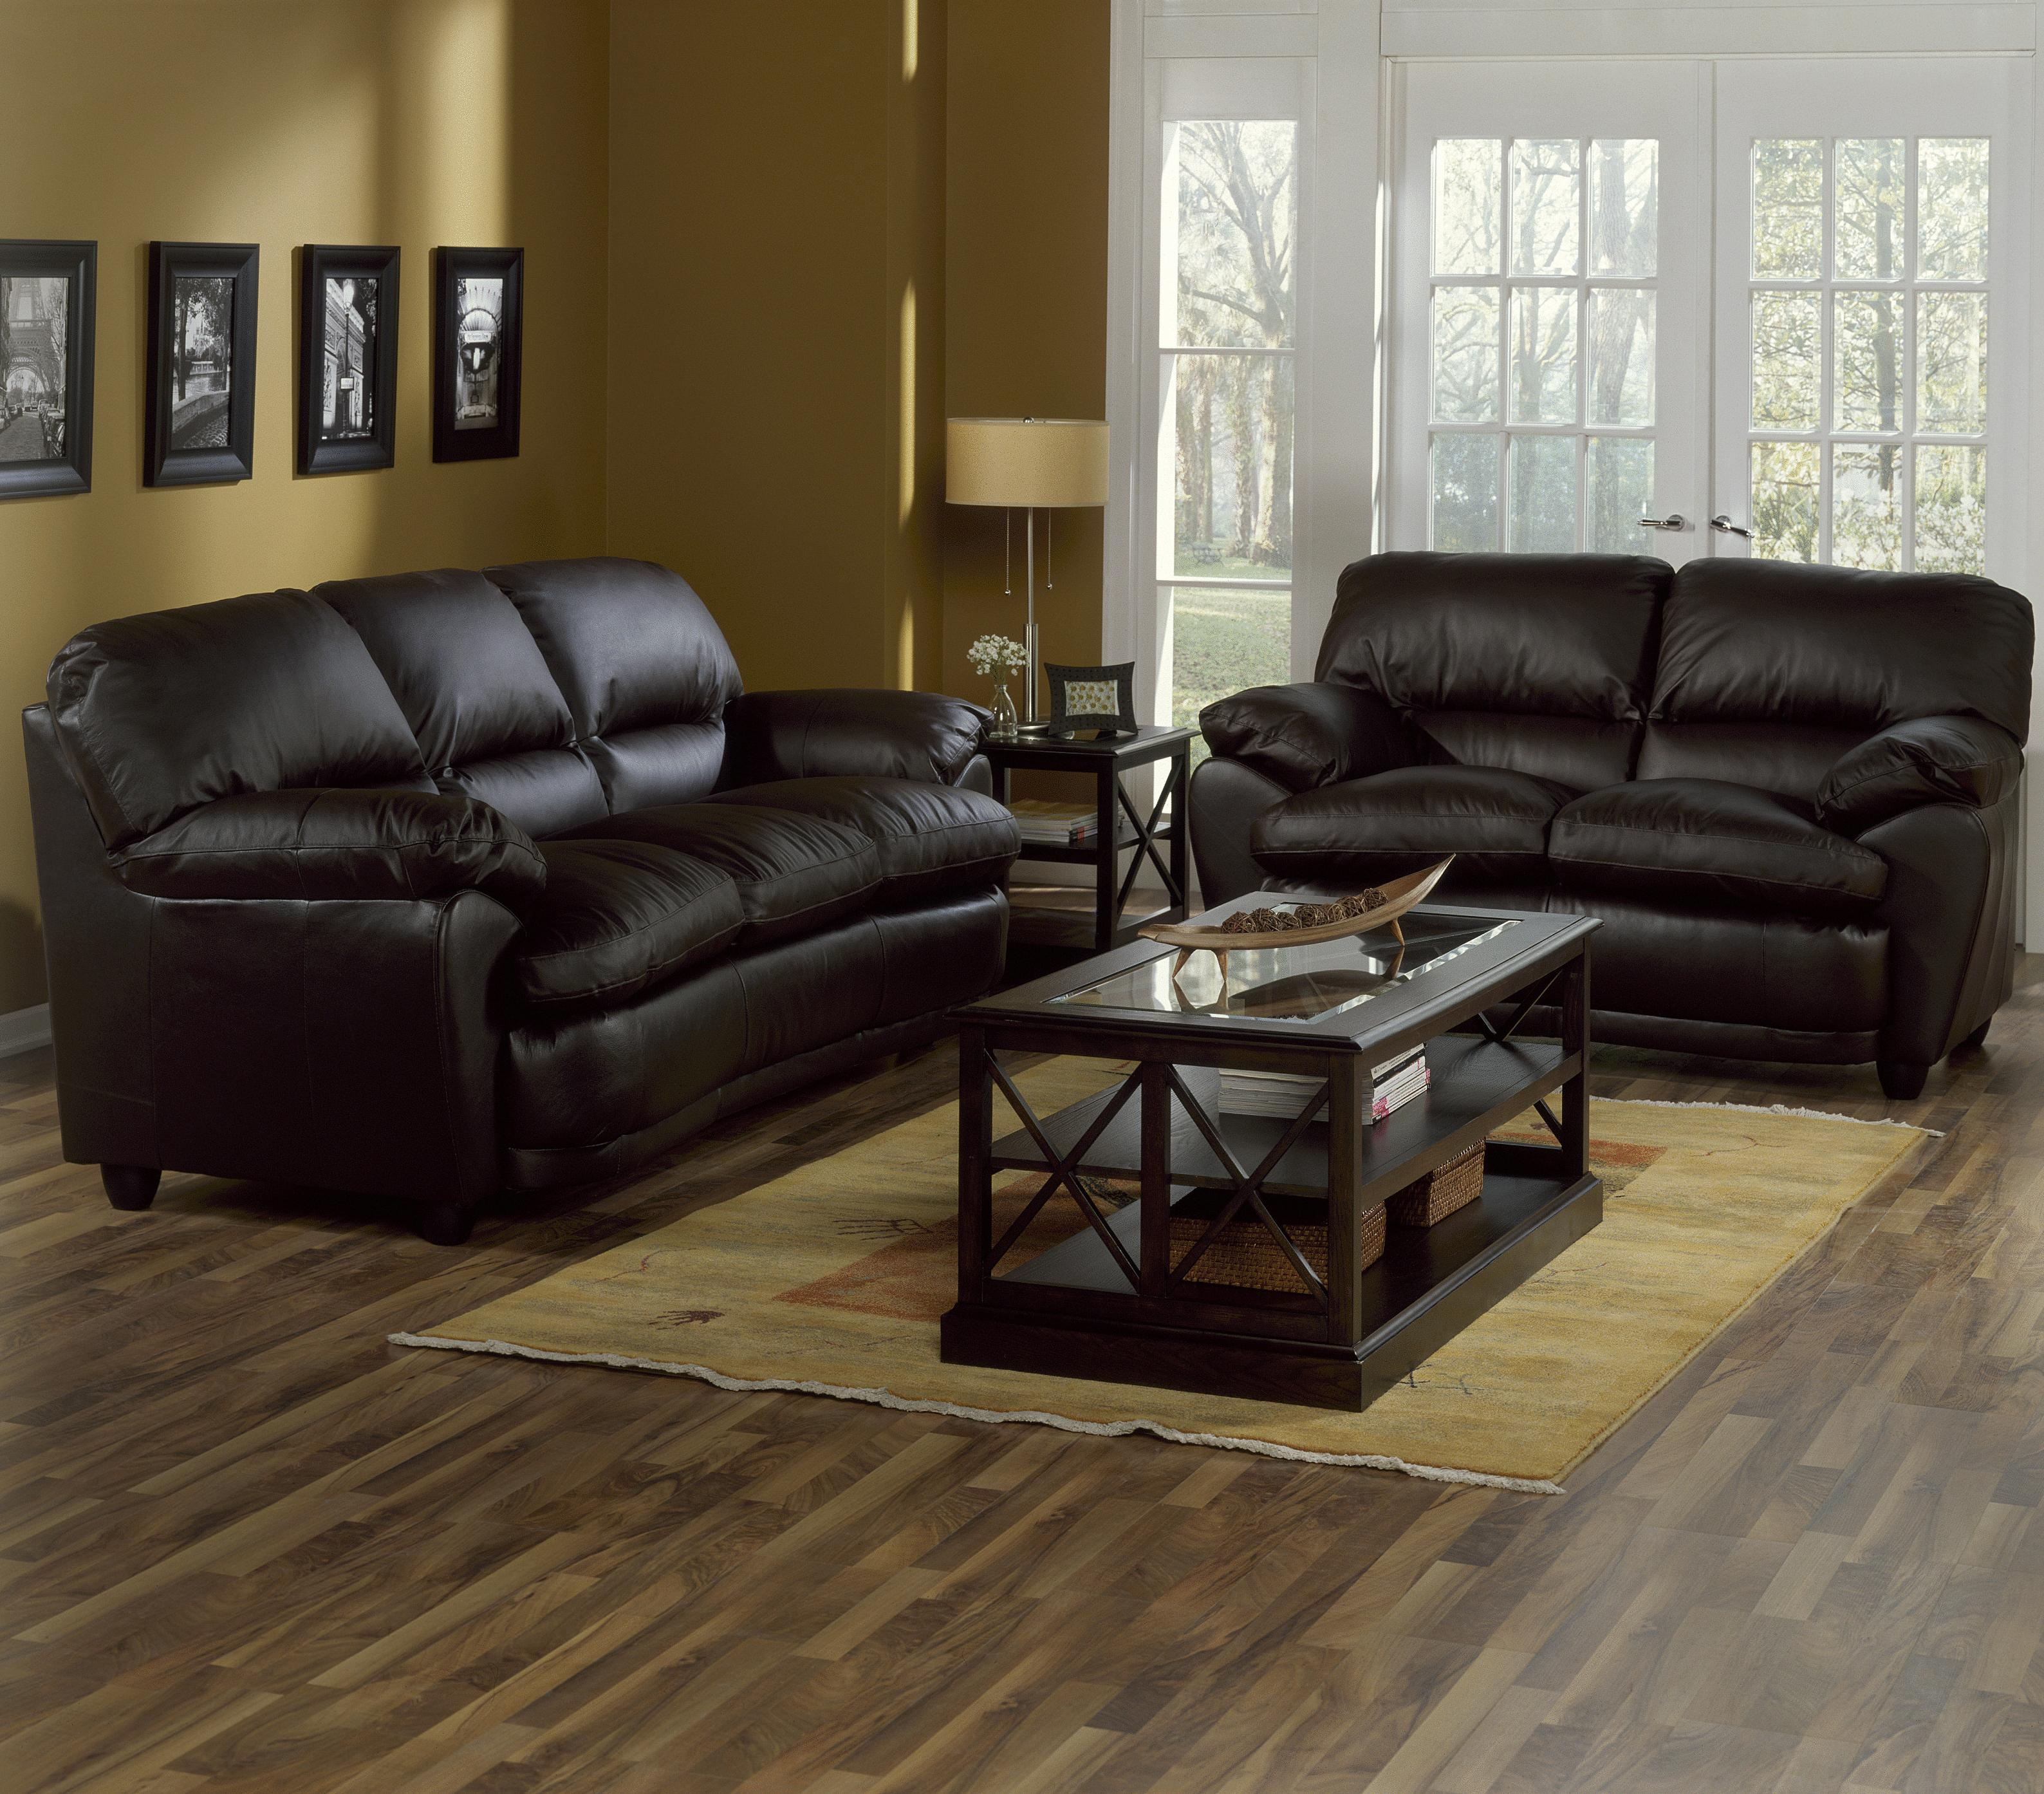 Living Room Furniture Northern Va: Palliser Harley Stationary Living Room Group